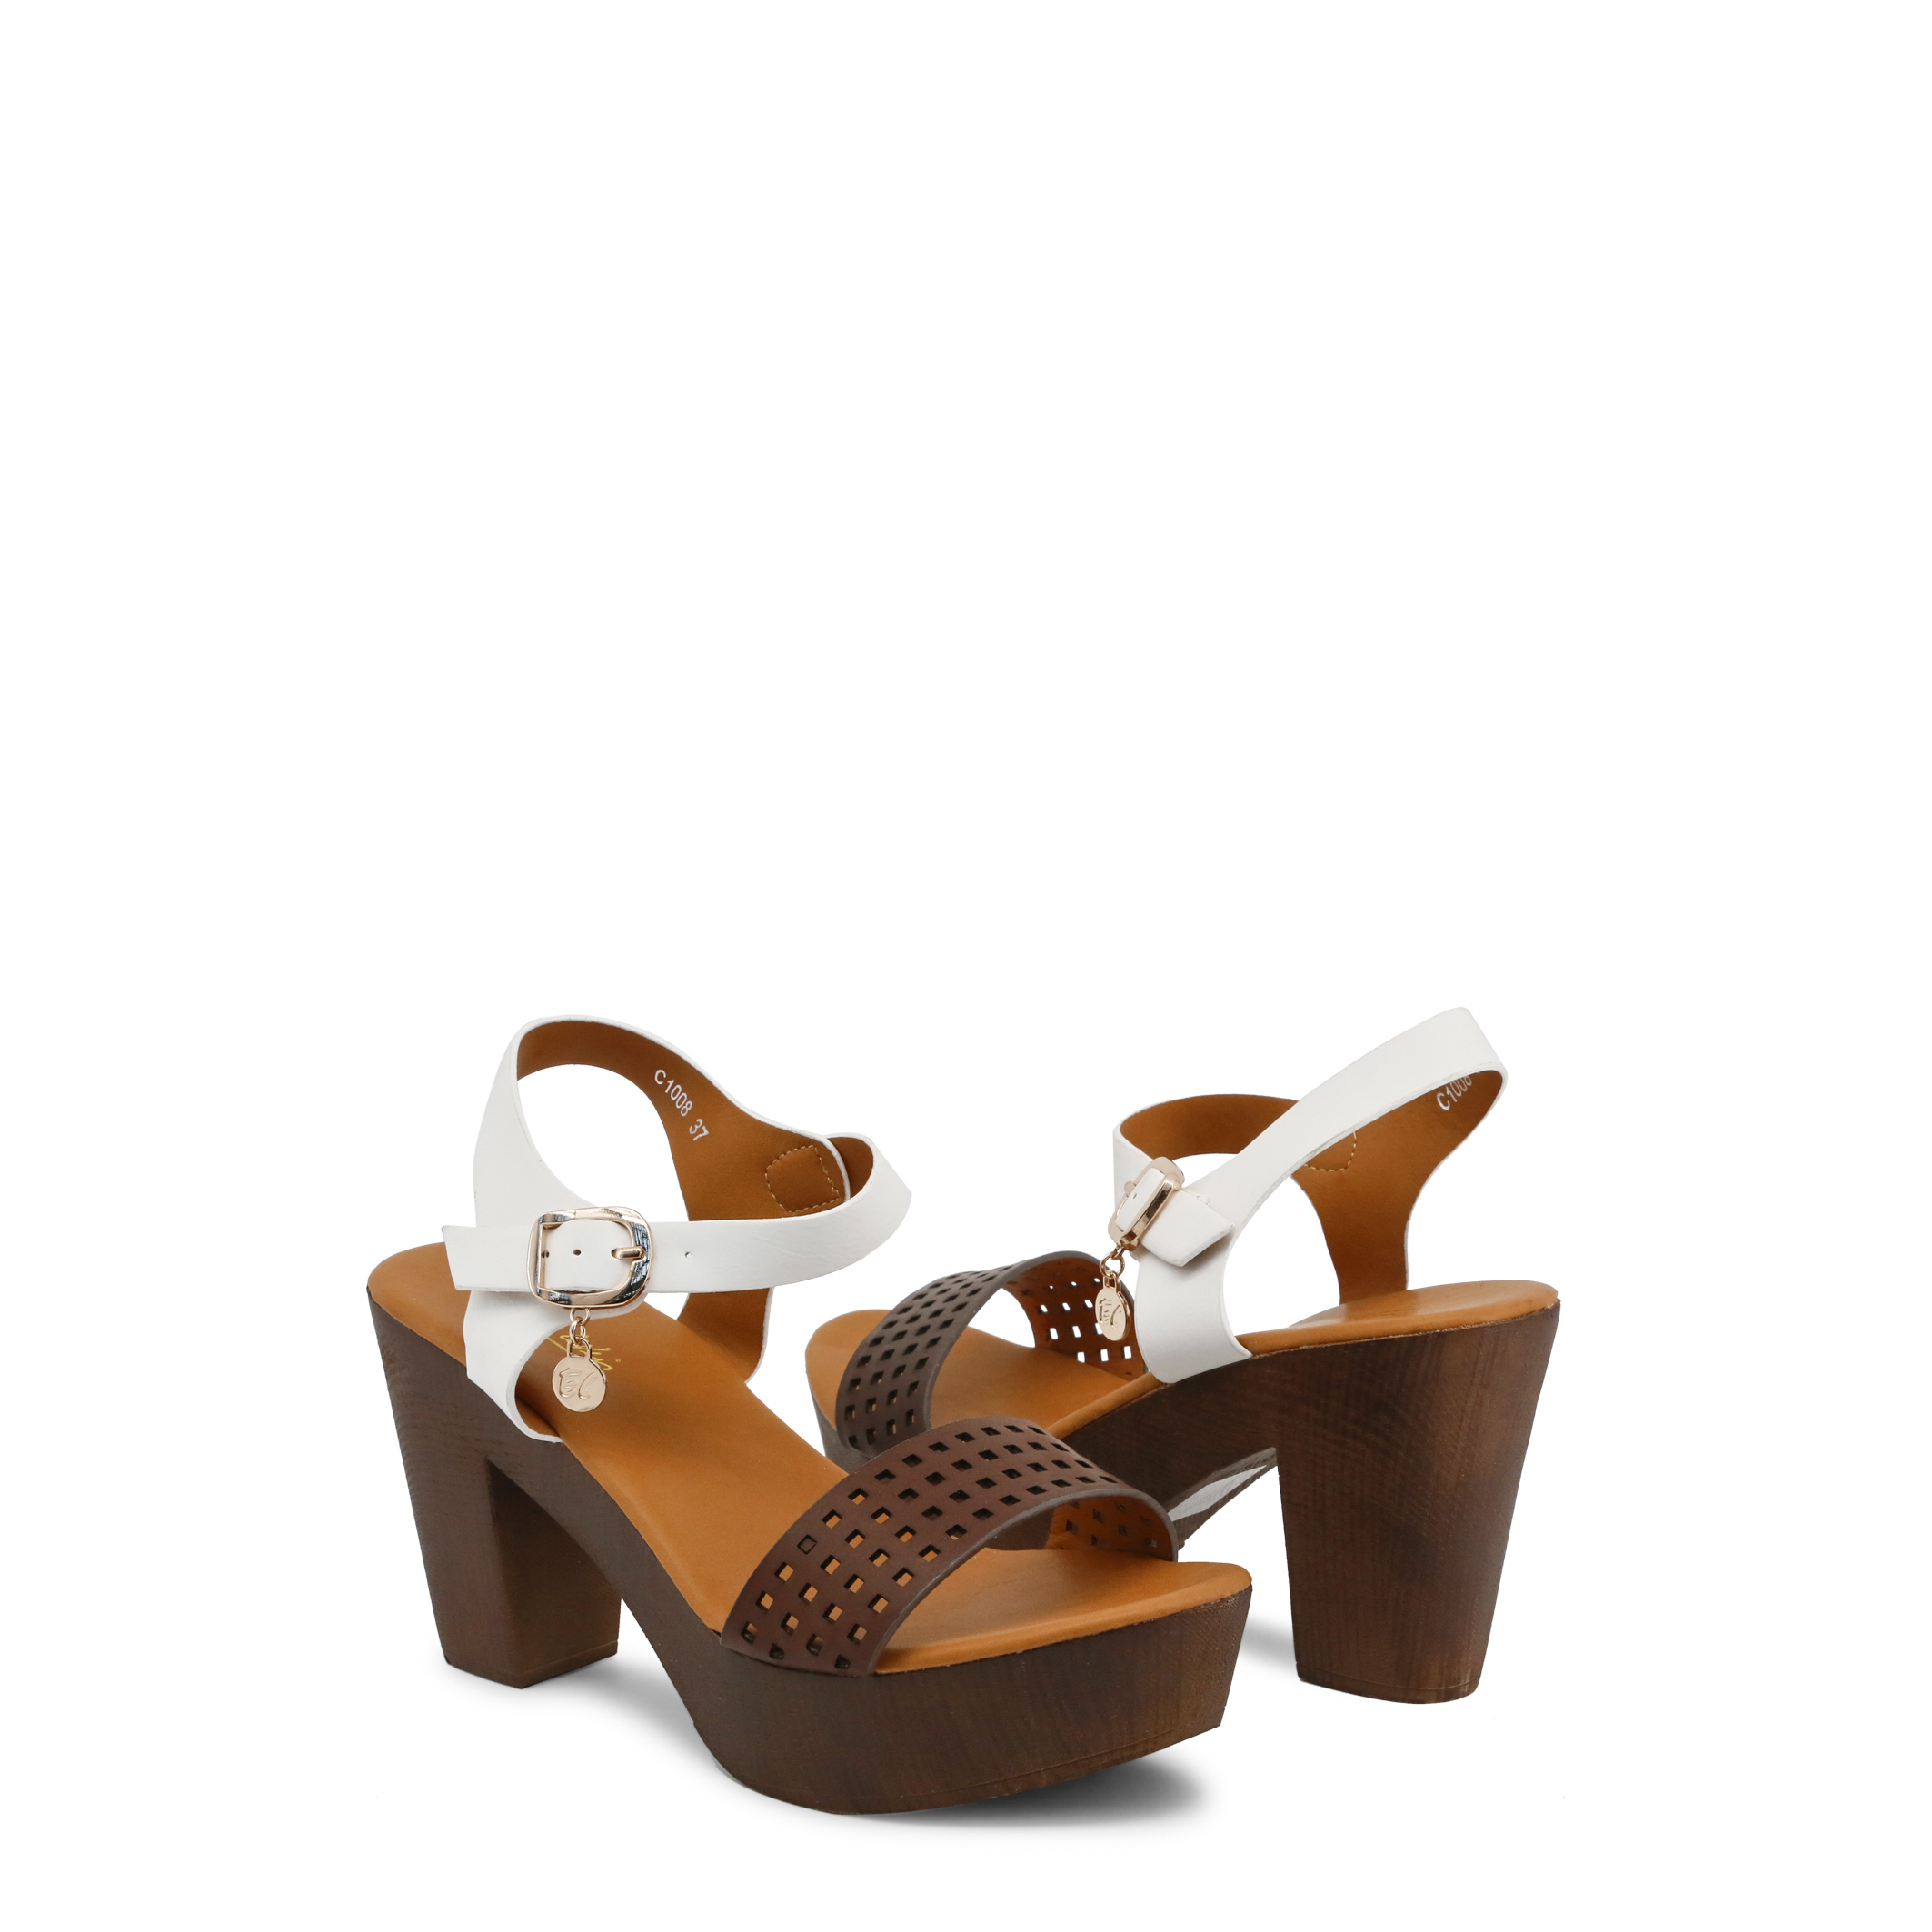 Zapatos Enrico Coveri Mujer C1008 CALF Zuecos Marrón/Marrón/Marrón Primavera/Ve